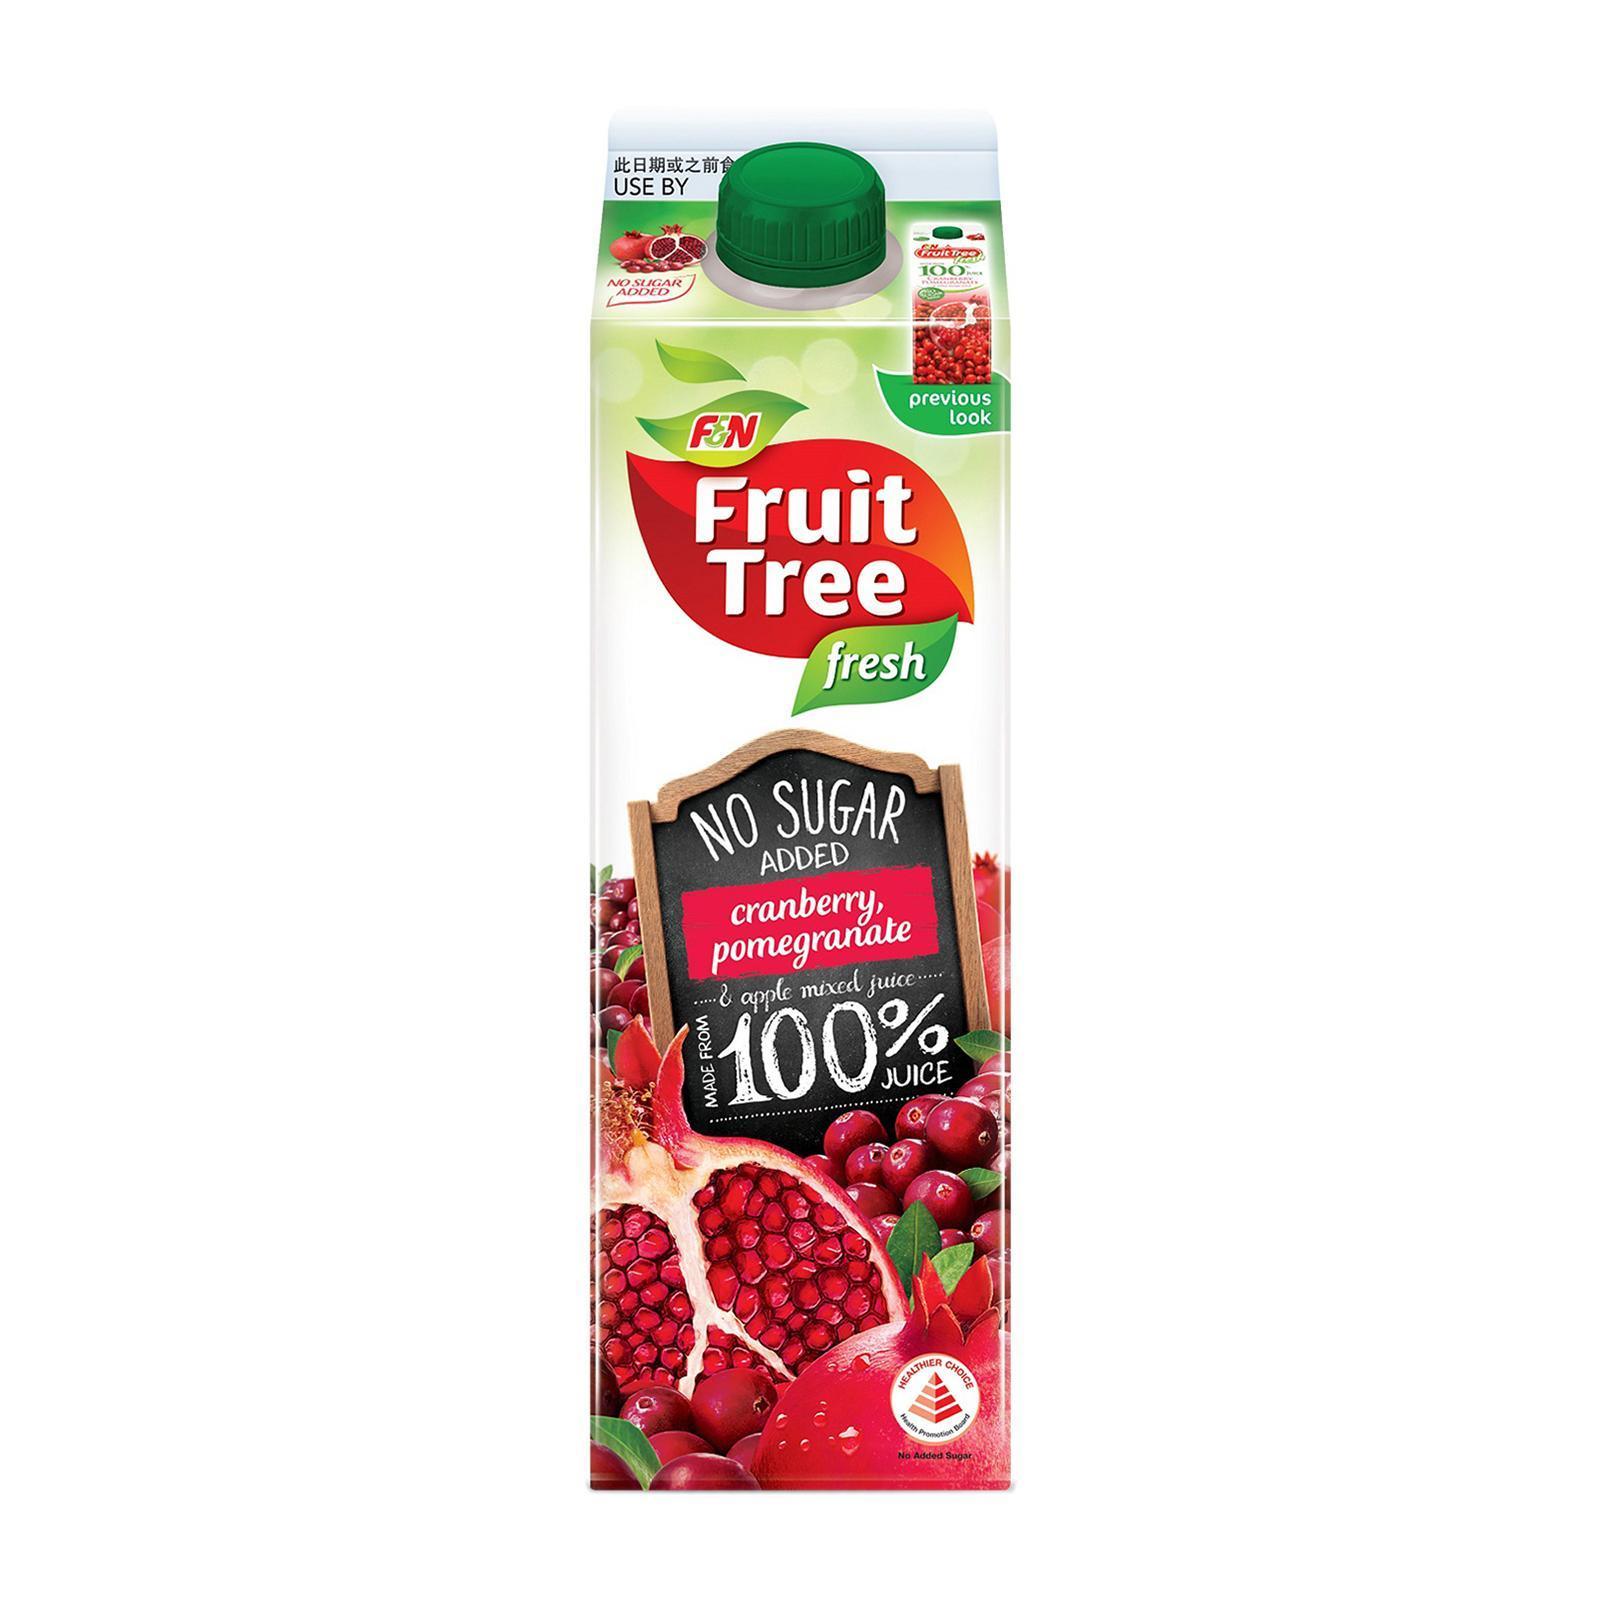 F&n Fruit Tree Fresh Cranberry Pomegranate - No Added Sugar By Redmart.